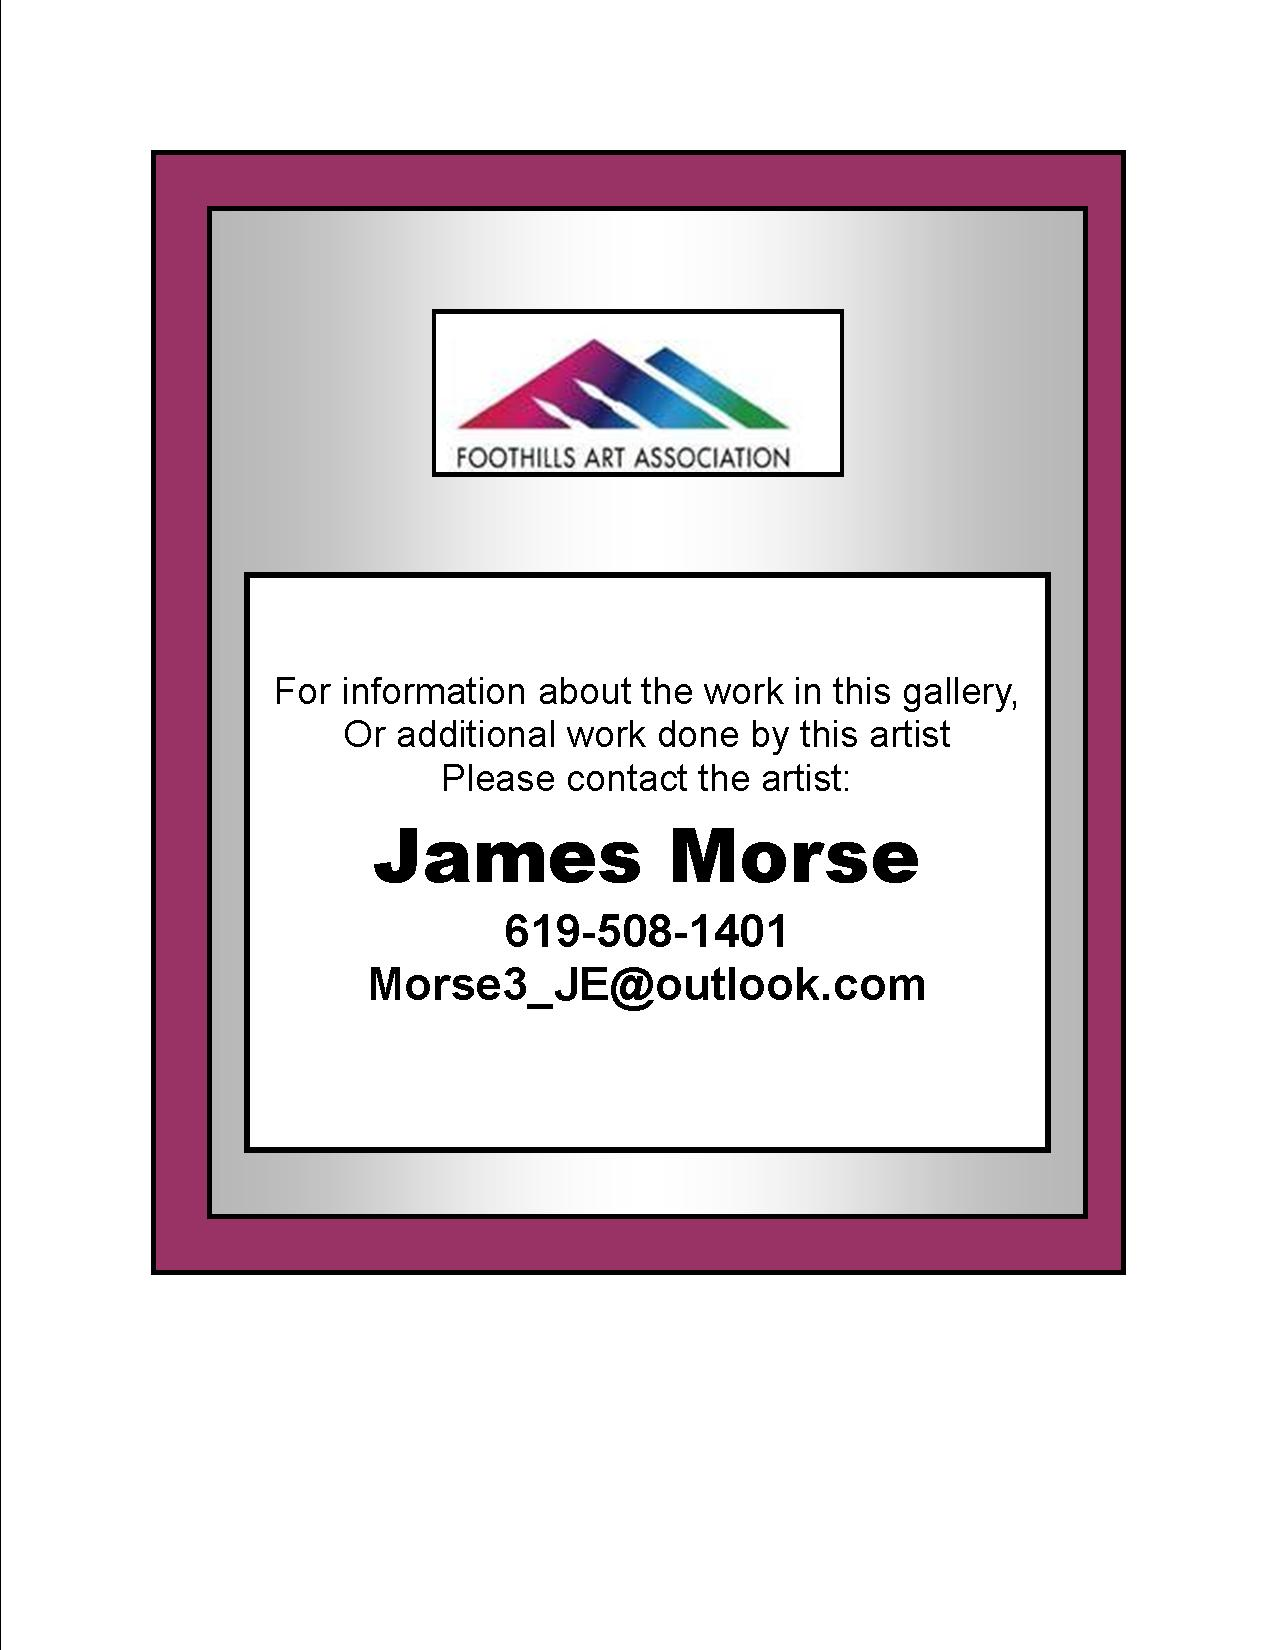 James Morse - Info